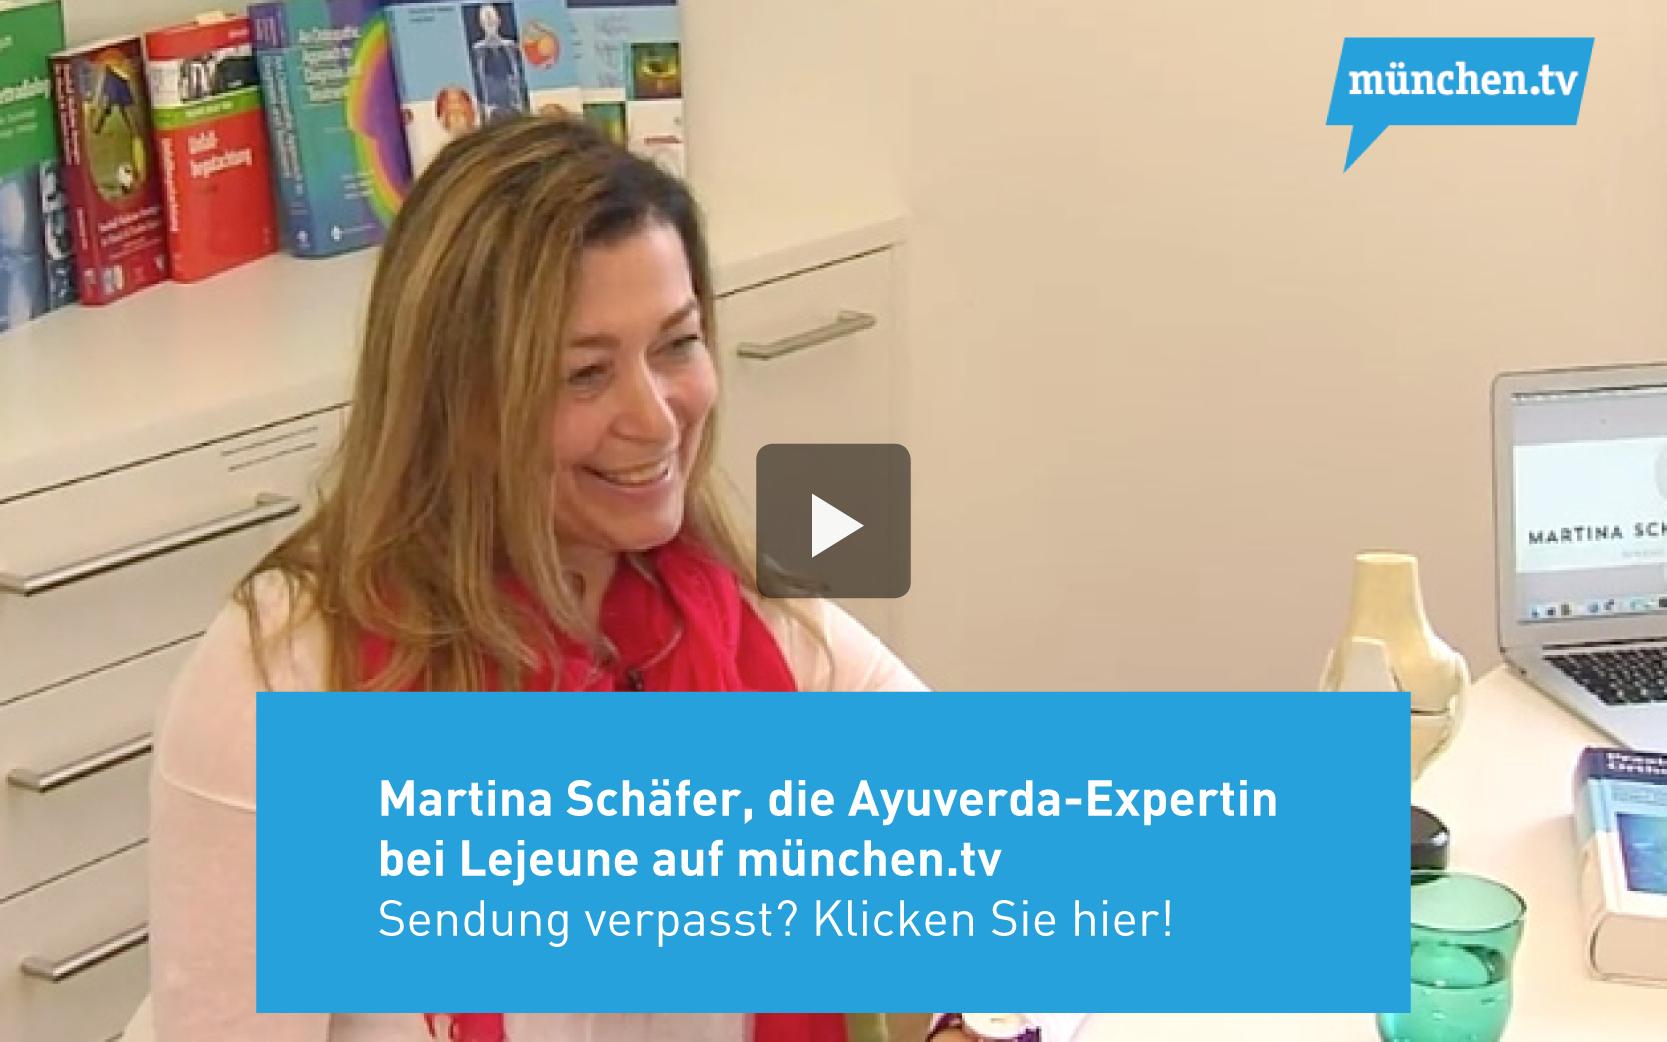 martina_schaefer_lejeune_muenchen-tv